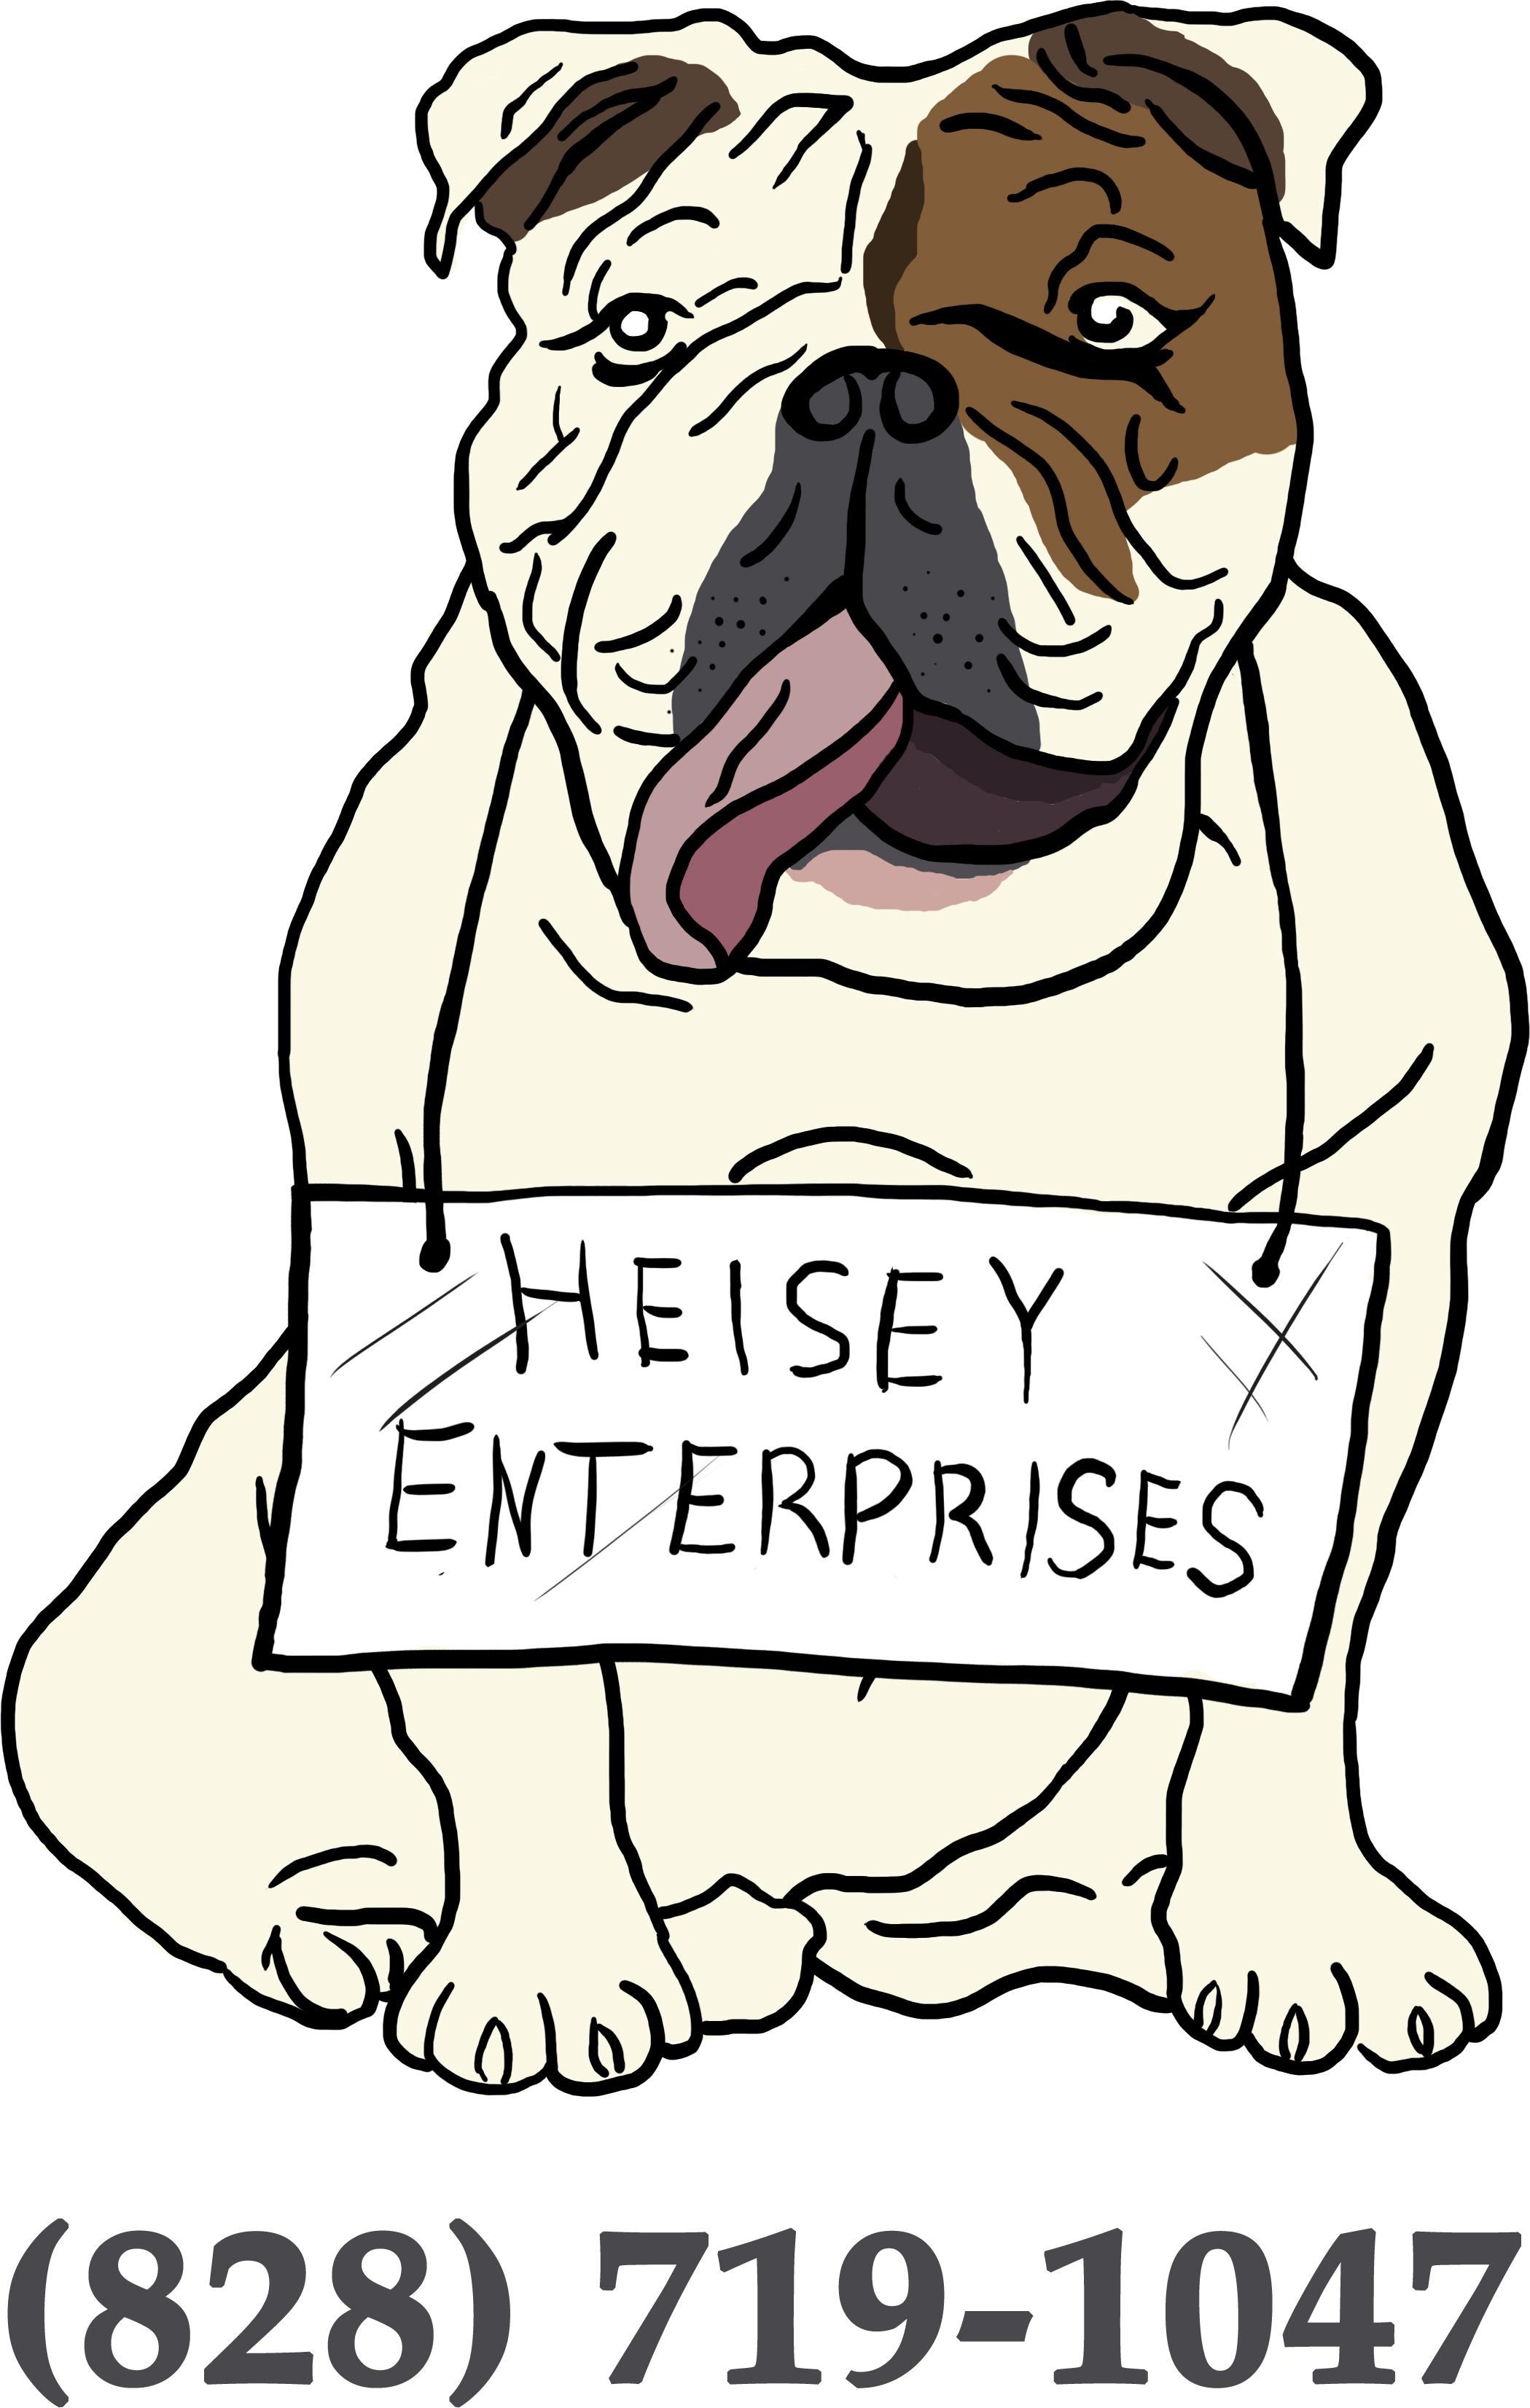 Heisey Enterprises logo